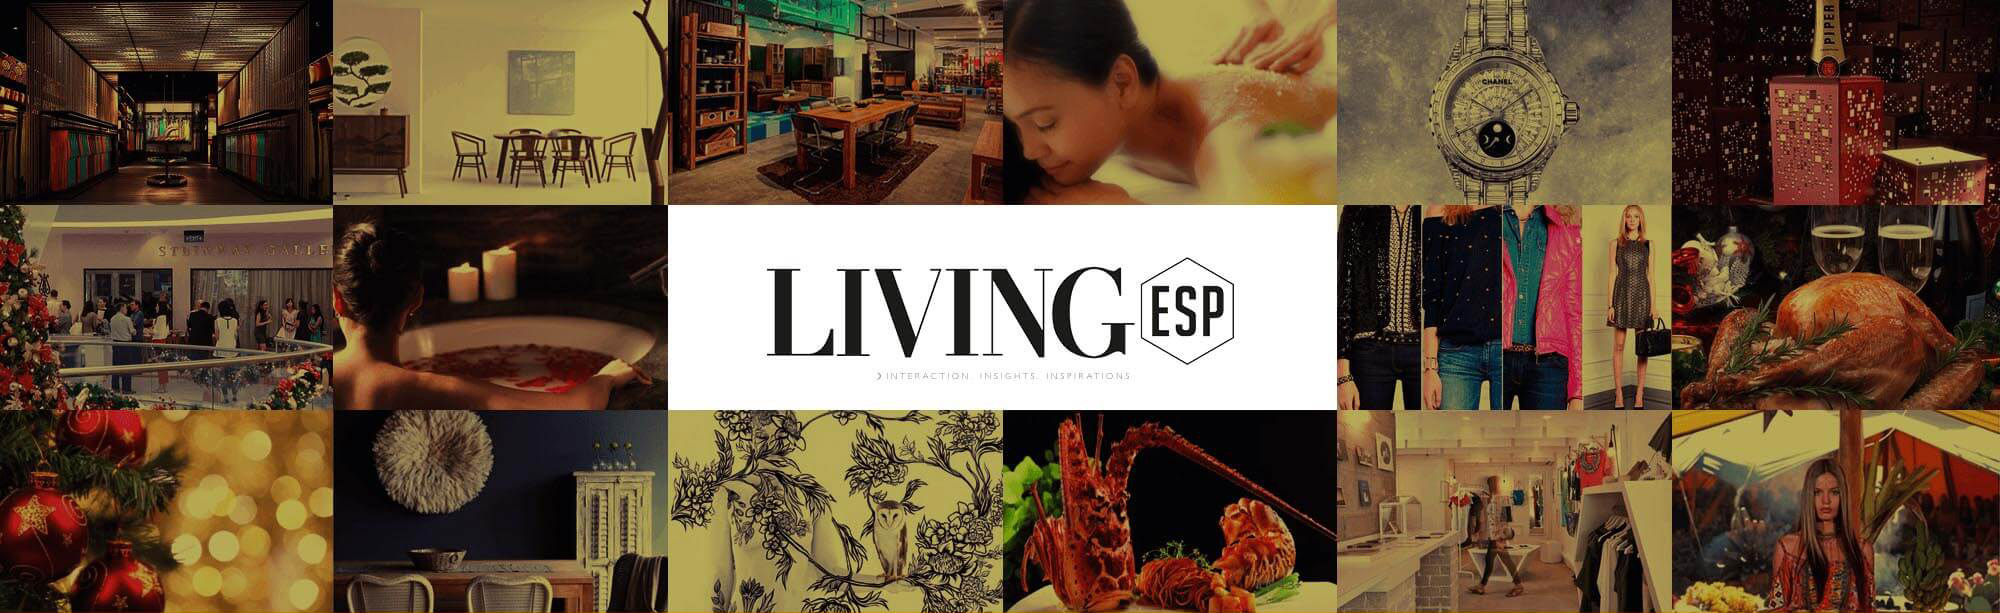 LivingESP